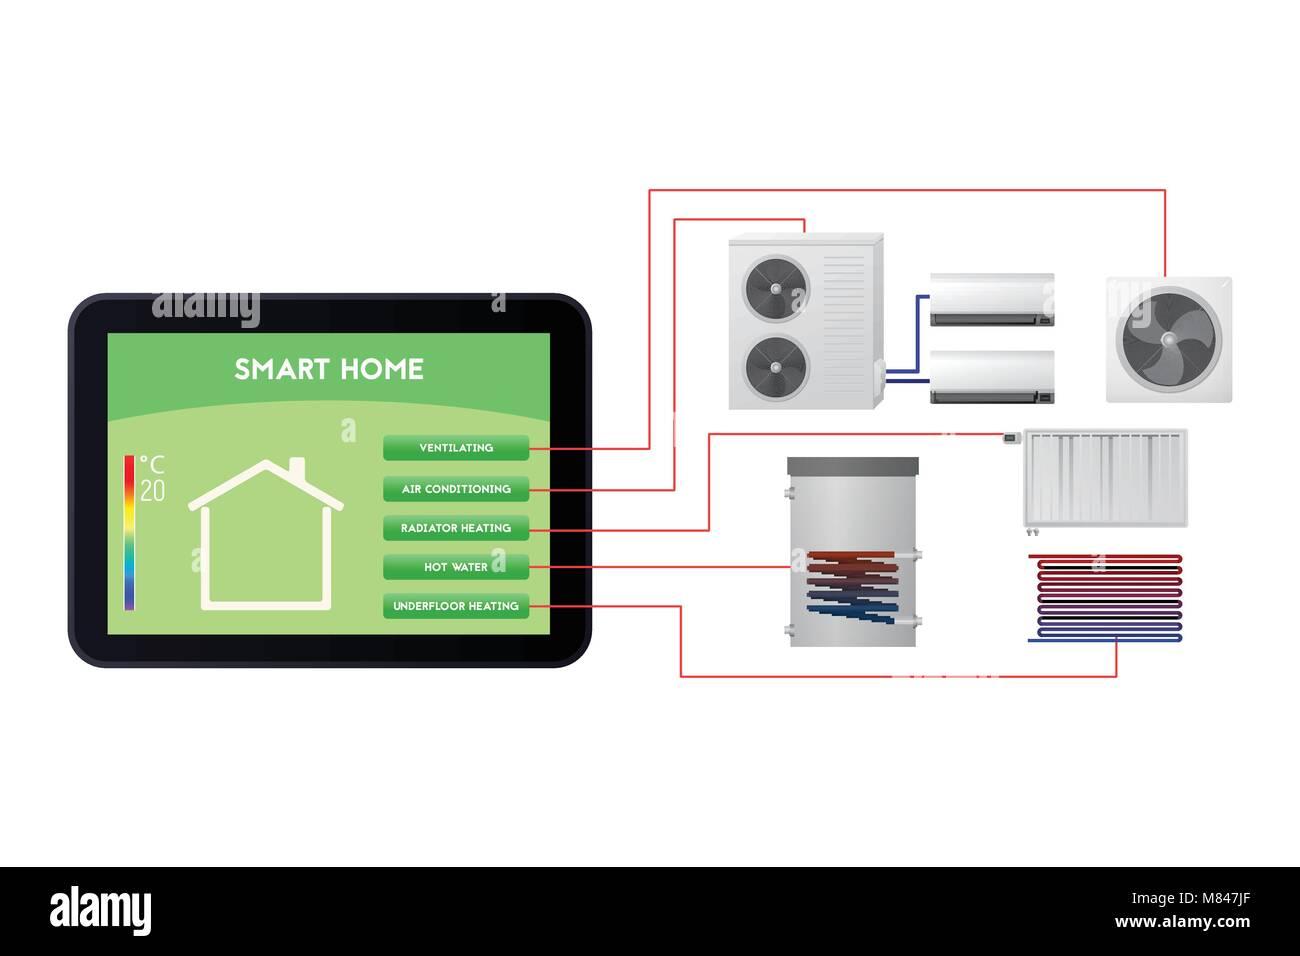 fussbodenheizung smarthome. Black Bedroom Furniture Sets. Home Design Ideas